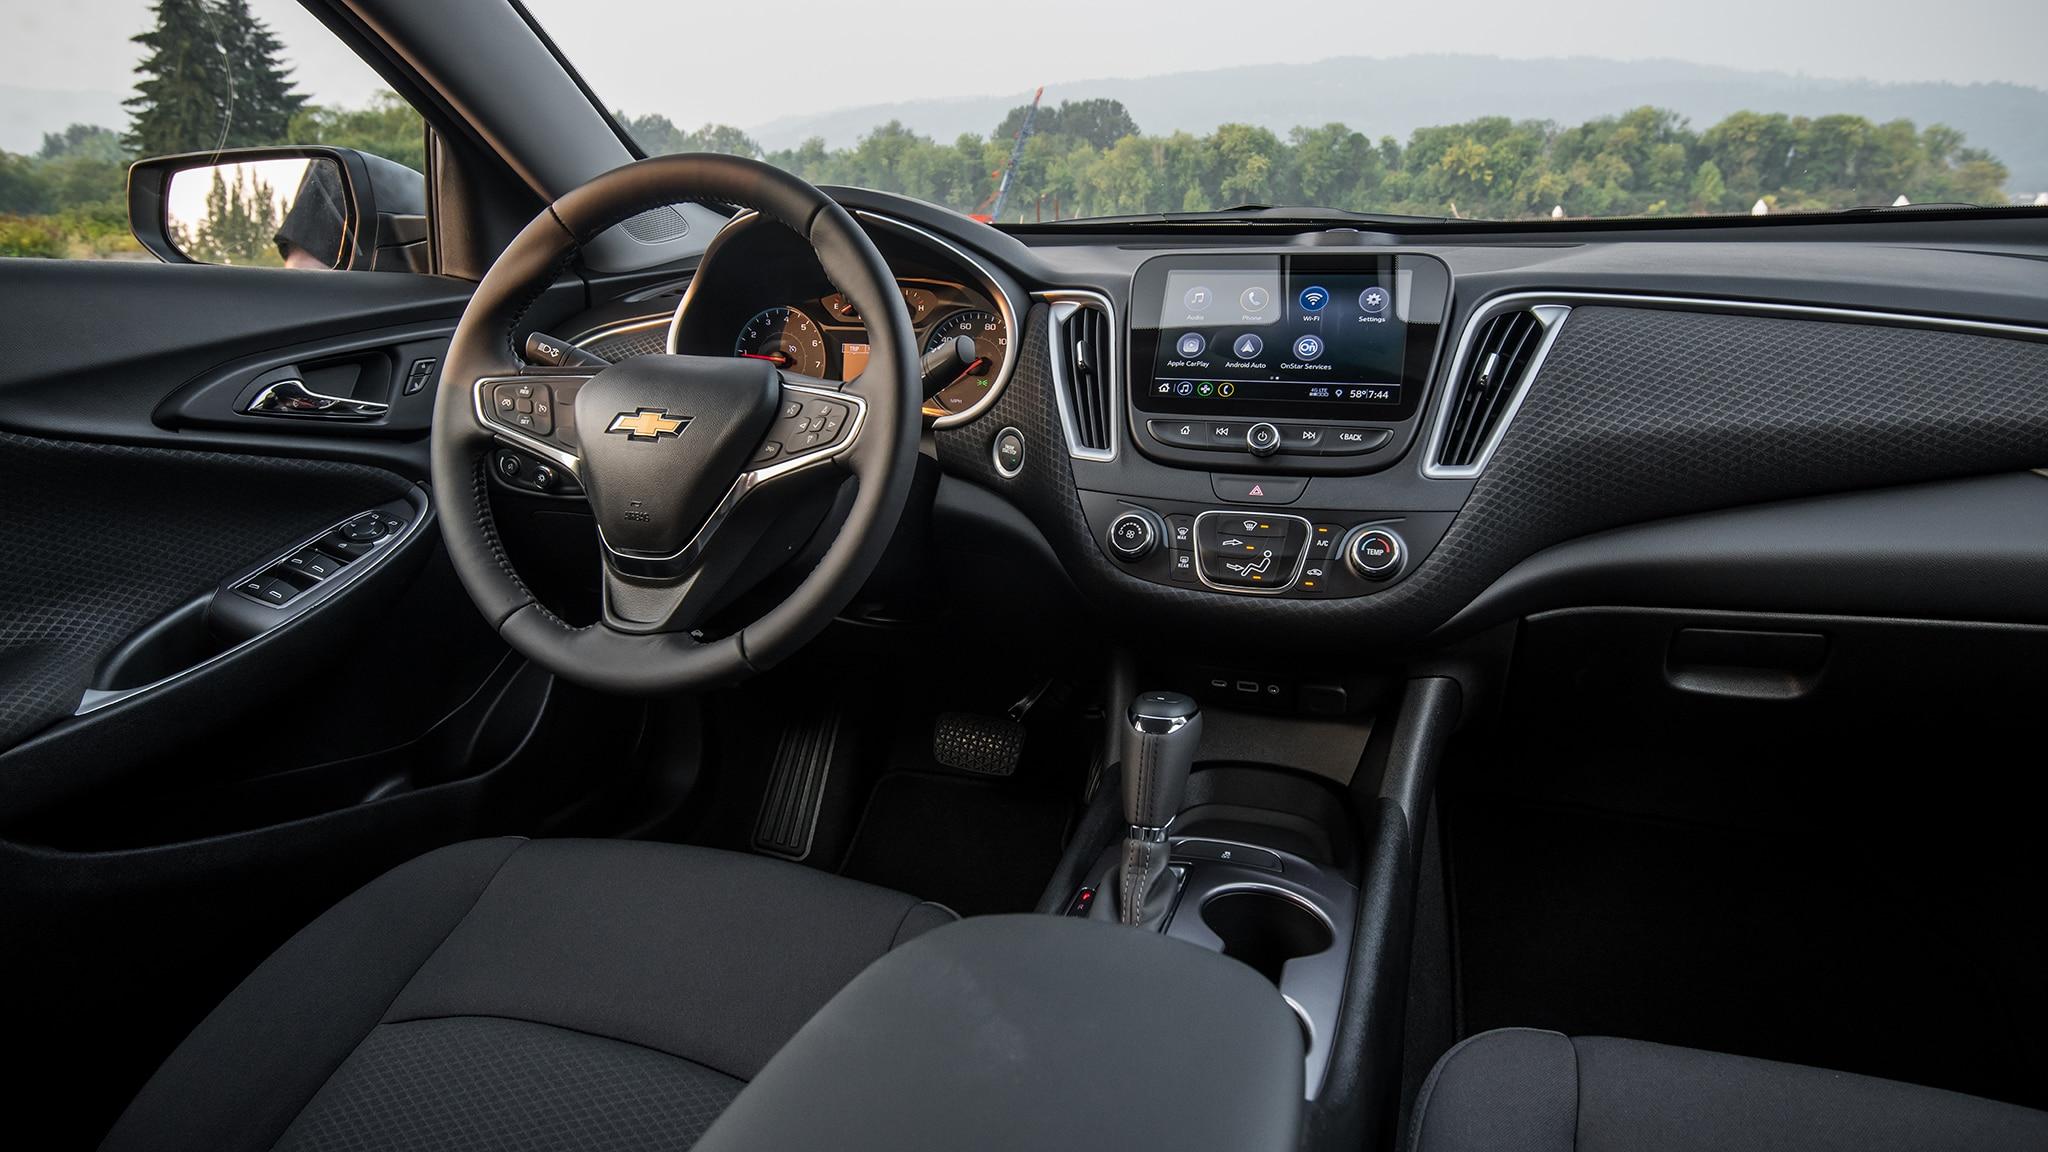 2019 Chevrolet Malibu RS interior 8 - Motor Trend en Español